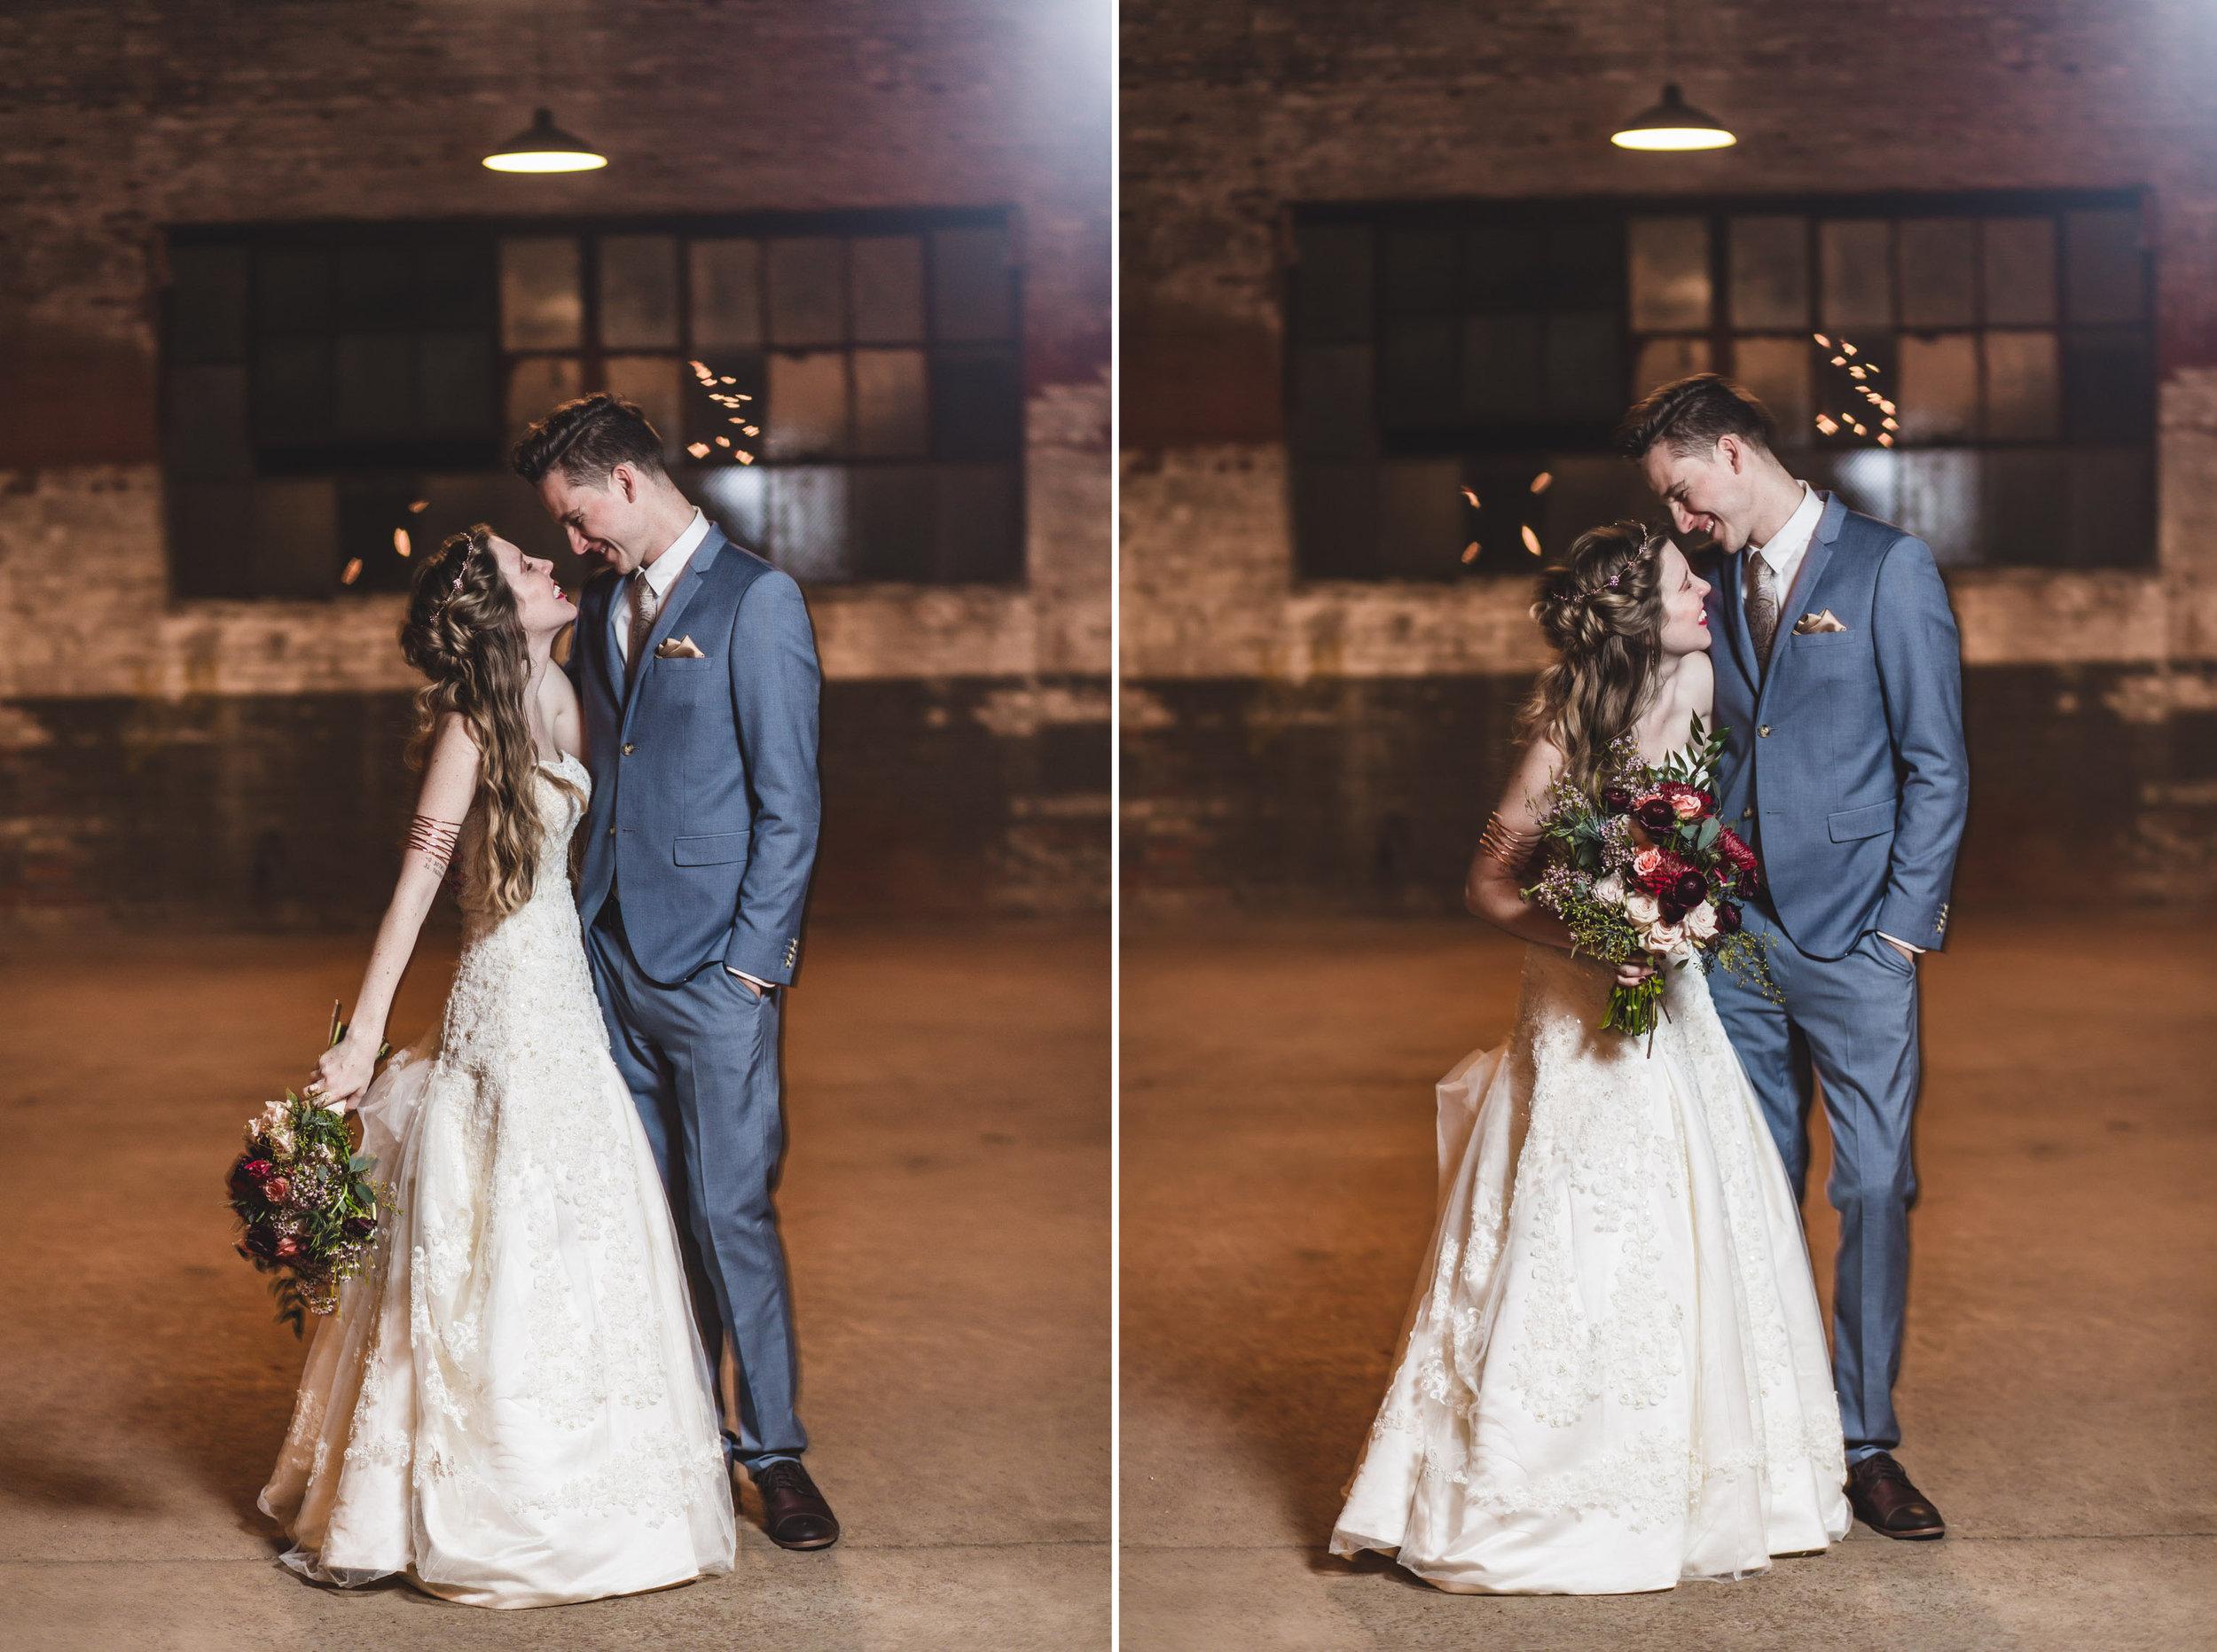 Adam-Szrmack-The-Glass-Factory-Wedding-131.jpg